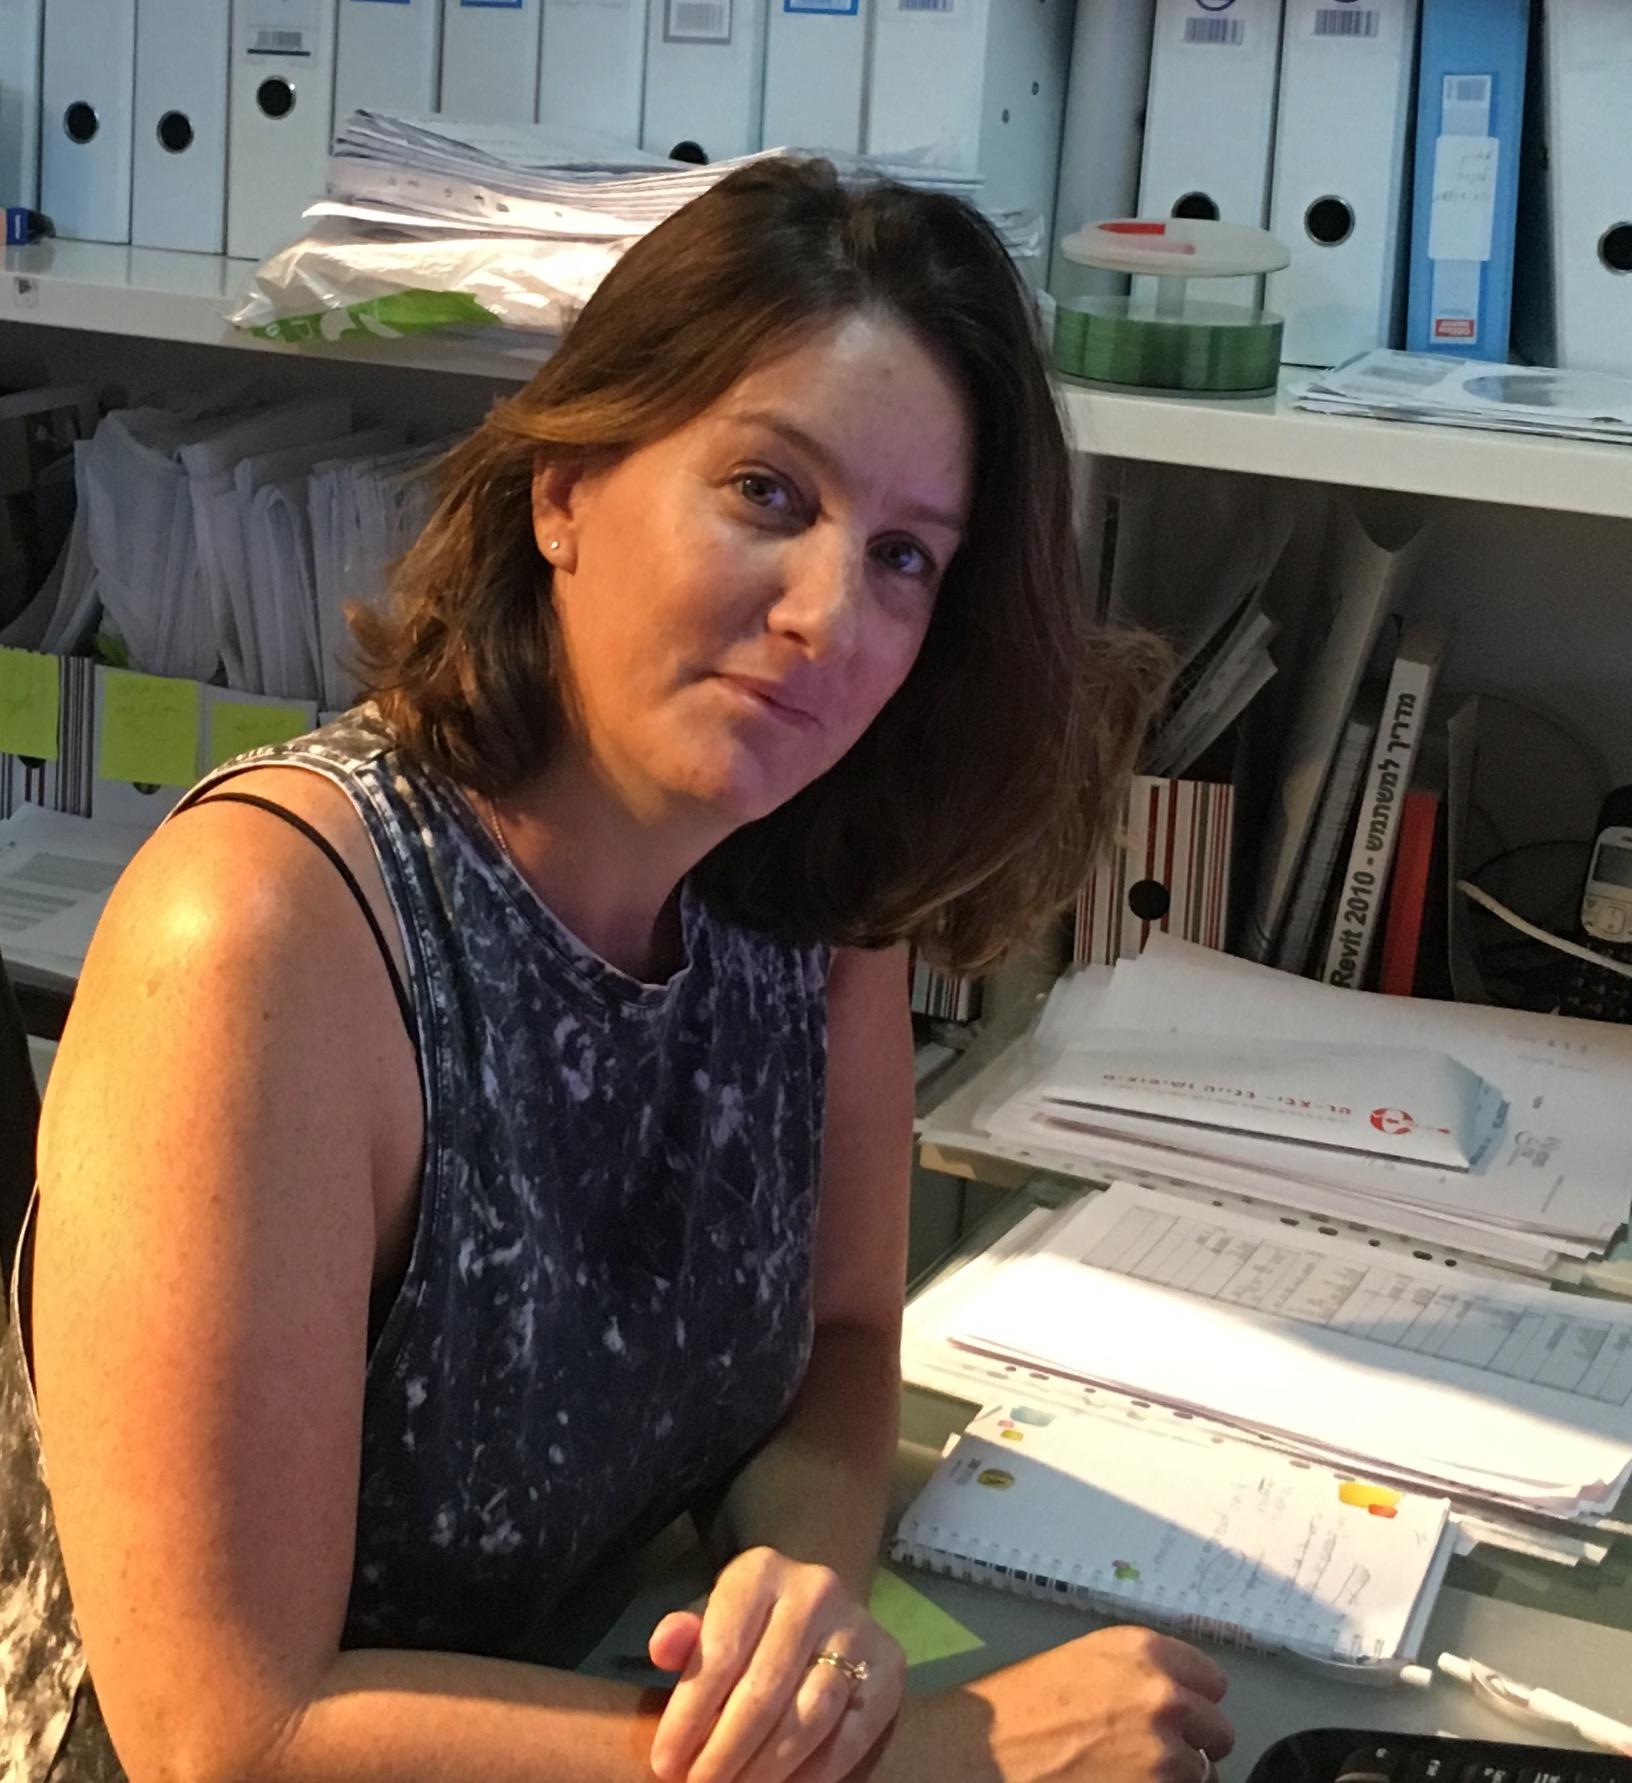 Architect Gabriella Barr-Sofer